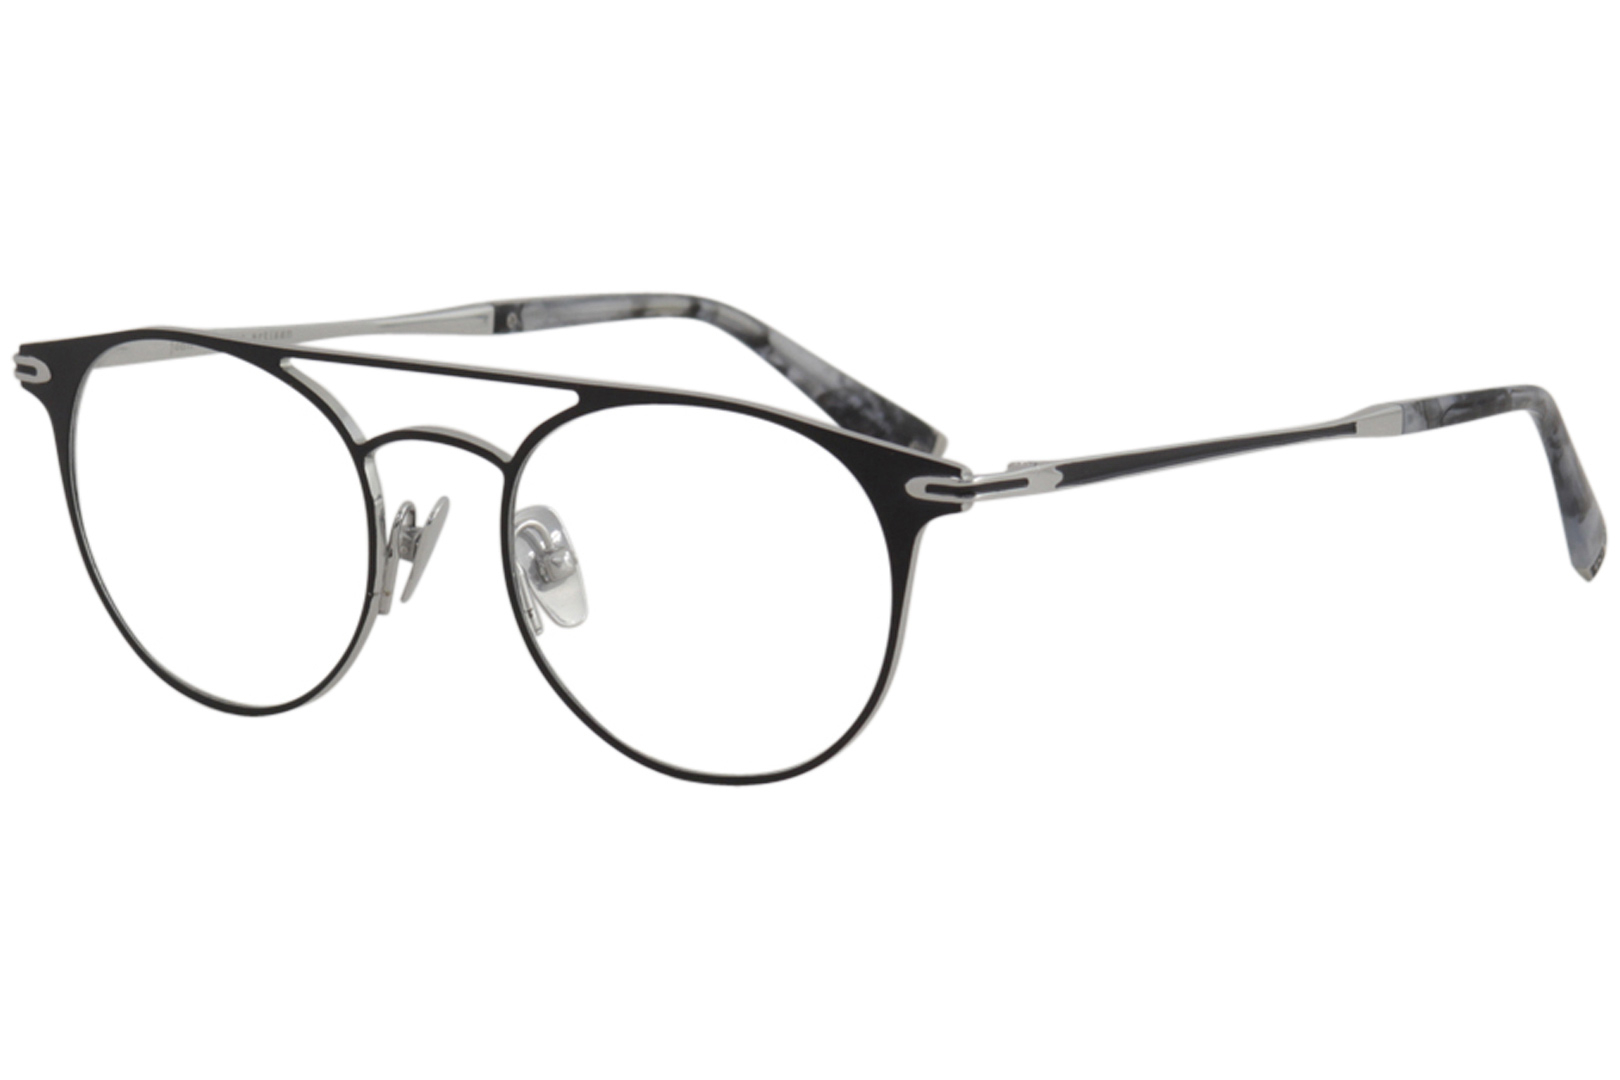 344f9b1eb6 John Varvatos Men s Eyeglasses V169 V 169 Matte Black Silver Optical ...